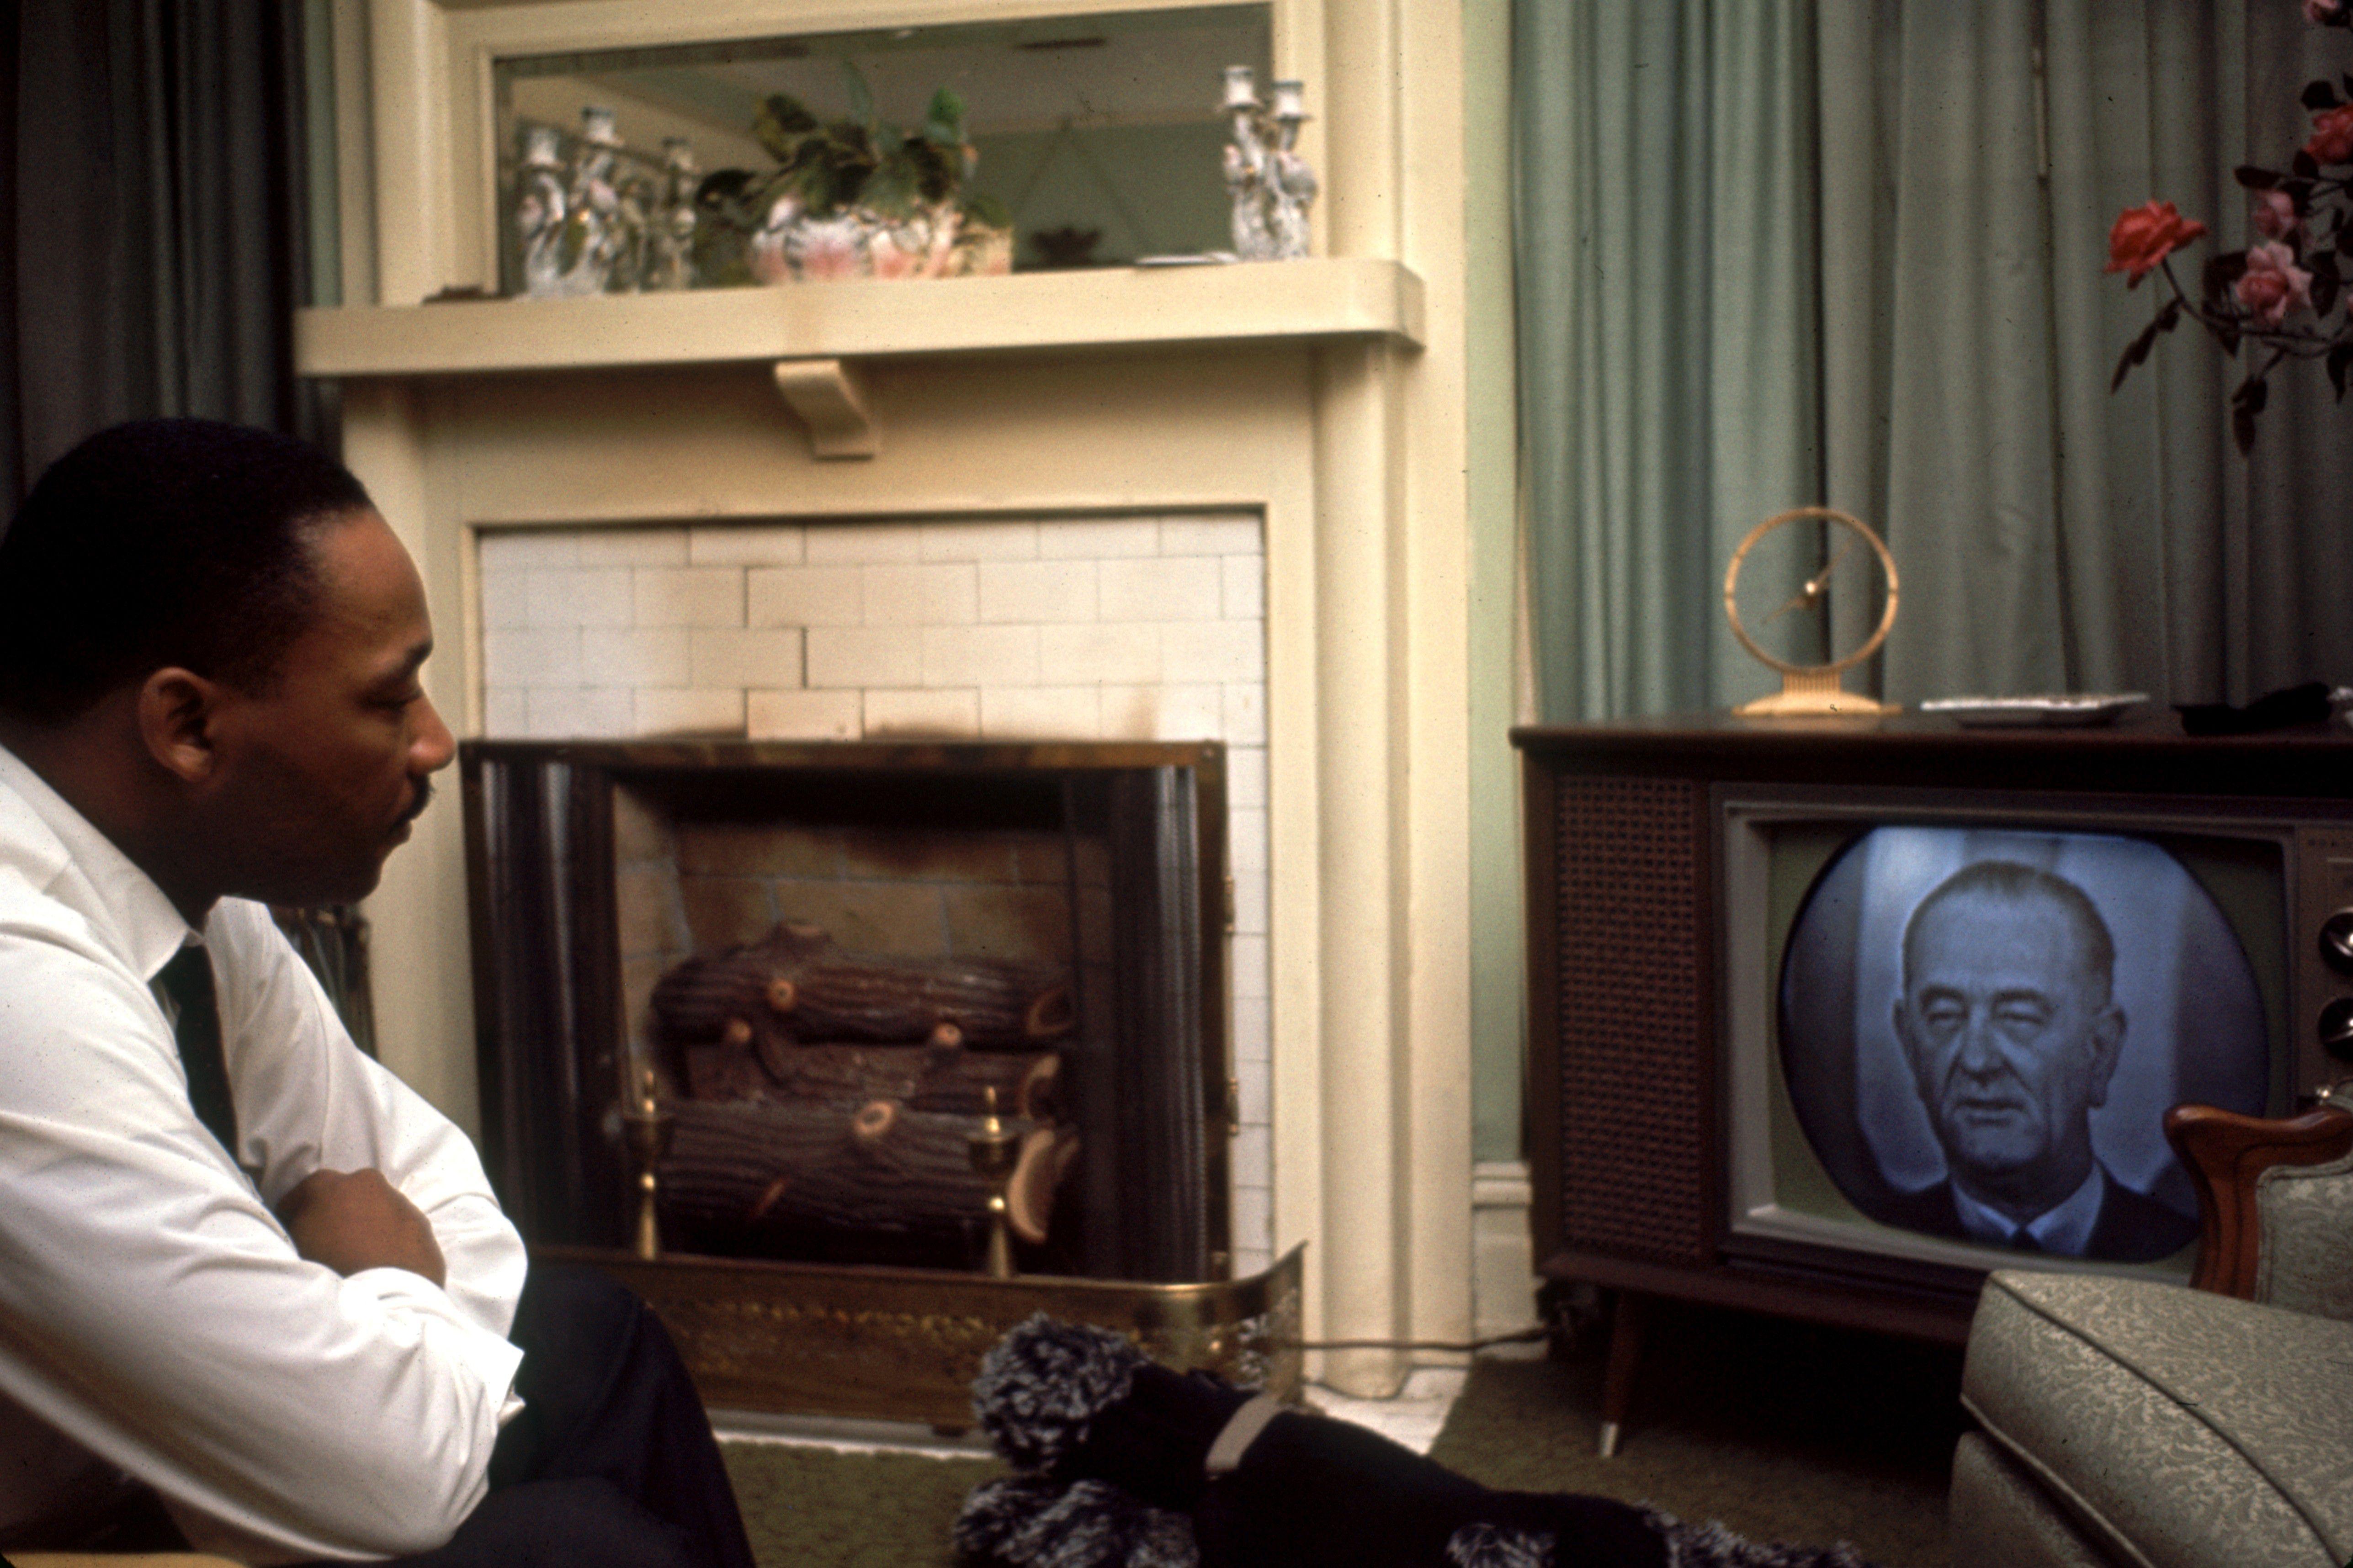 Martin Luther King, Jr. watching President Lyndon Johnson on TV.